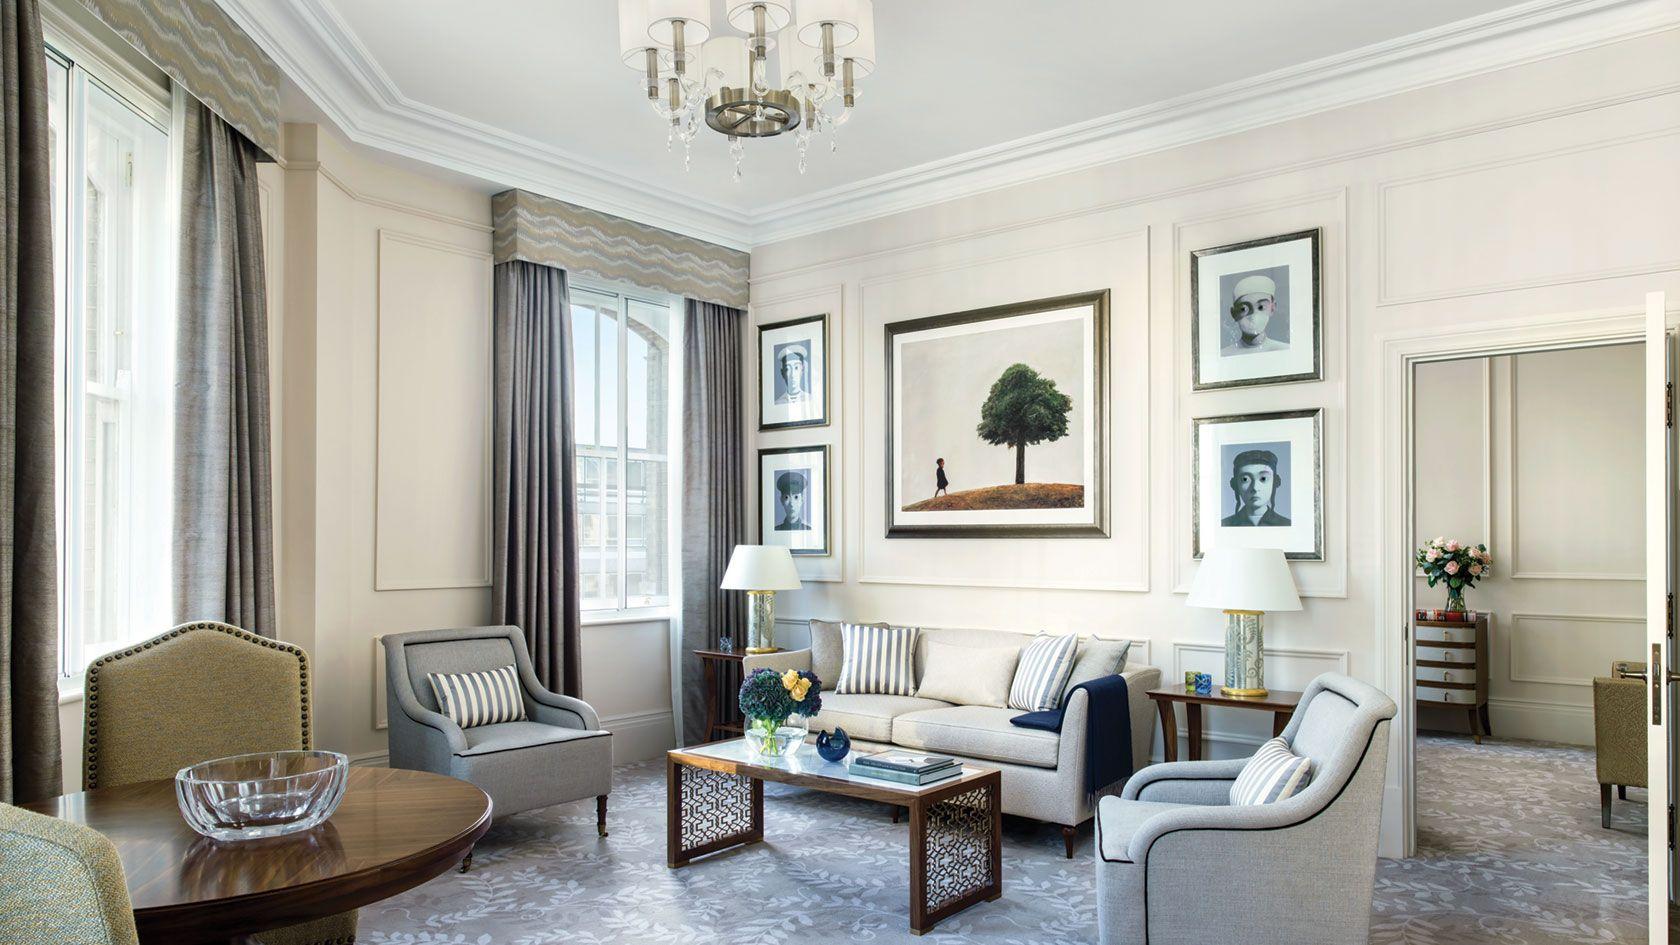 One Bedroom Residence London Luxury Hotel The Langham